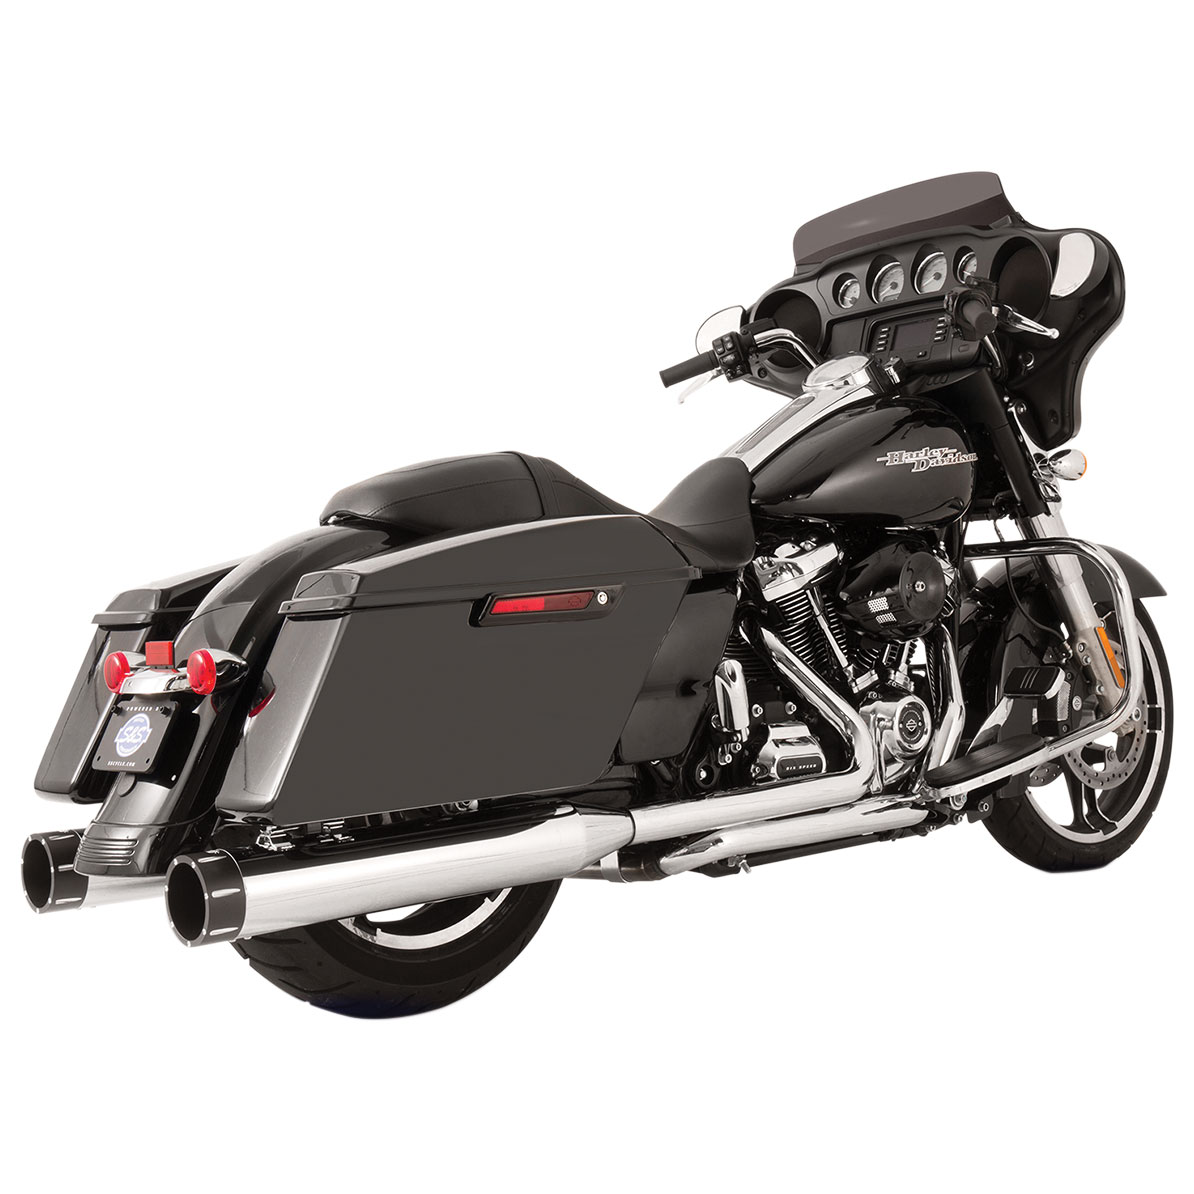 S&S Cycle MK45 El Dorado Exhaust Chrome with Tracer End Cap